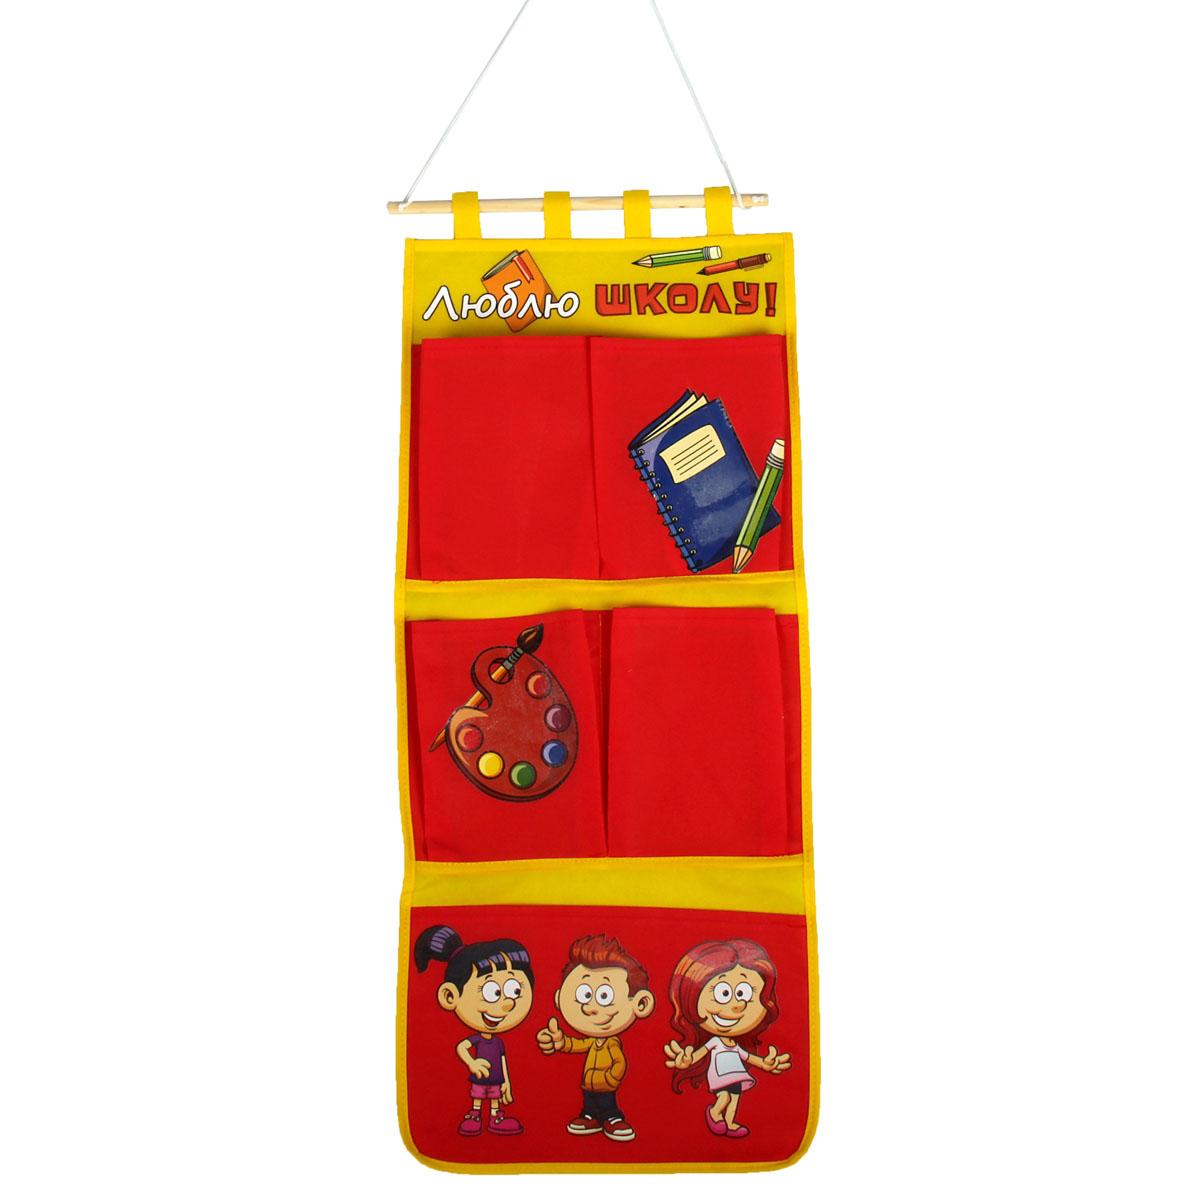 Кармашки на стену Sima-land Люблю школу!, цвет: красный, желтый, коричневый, 5 шт кармашки на стену sima land люблю школу цвет красный желтый коричневый 5 шт